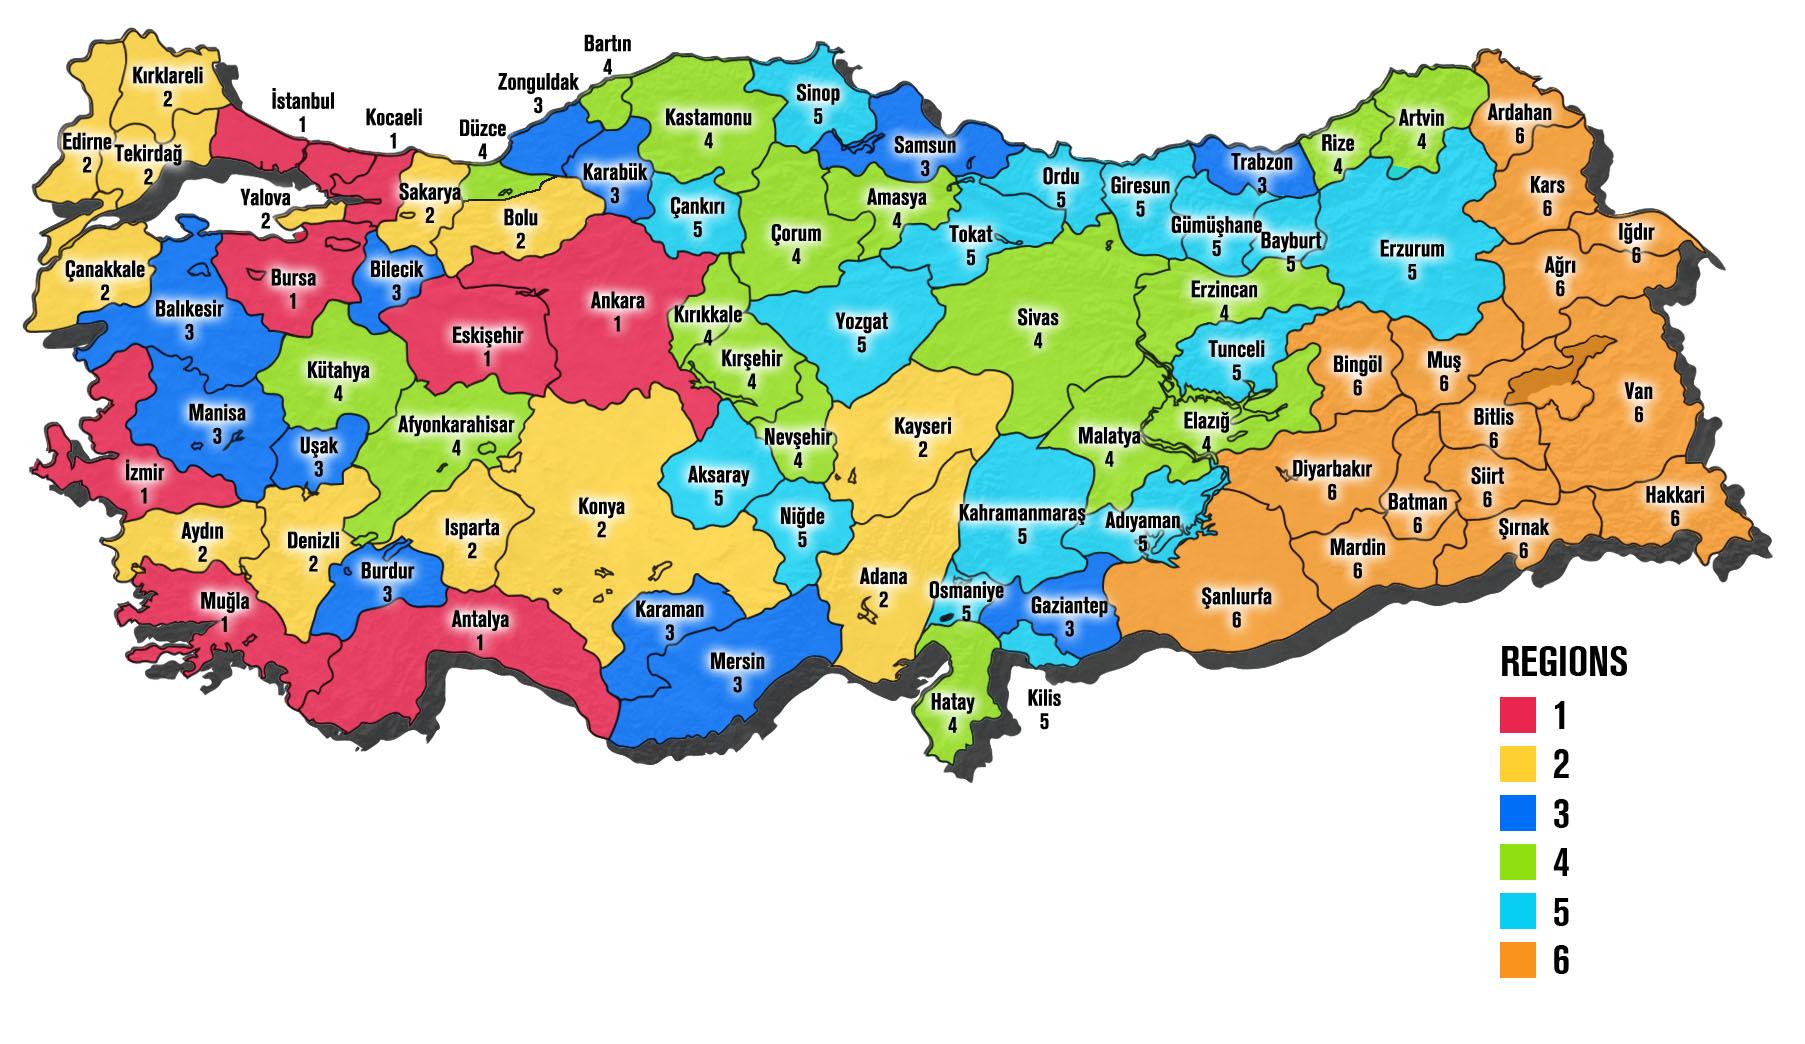 turkeyincentivesmapEN News